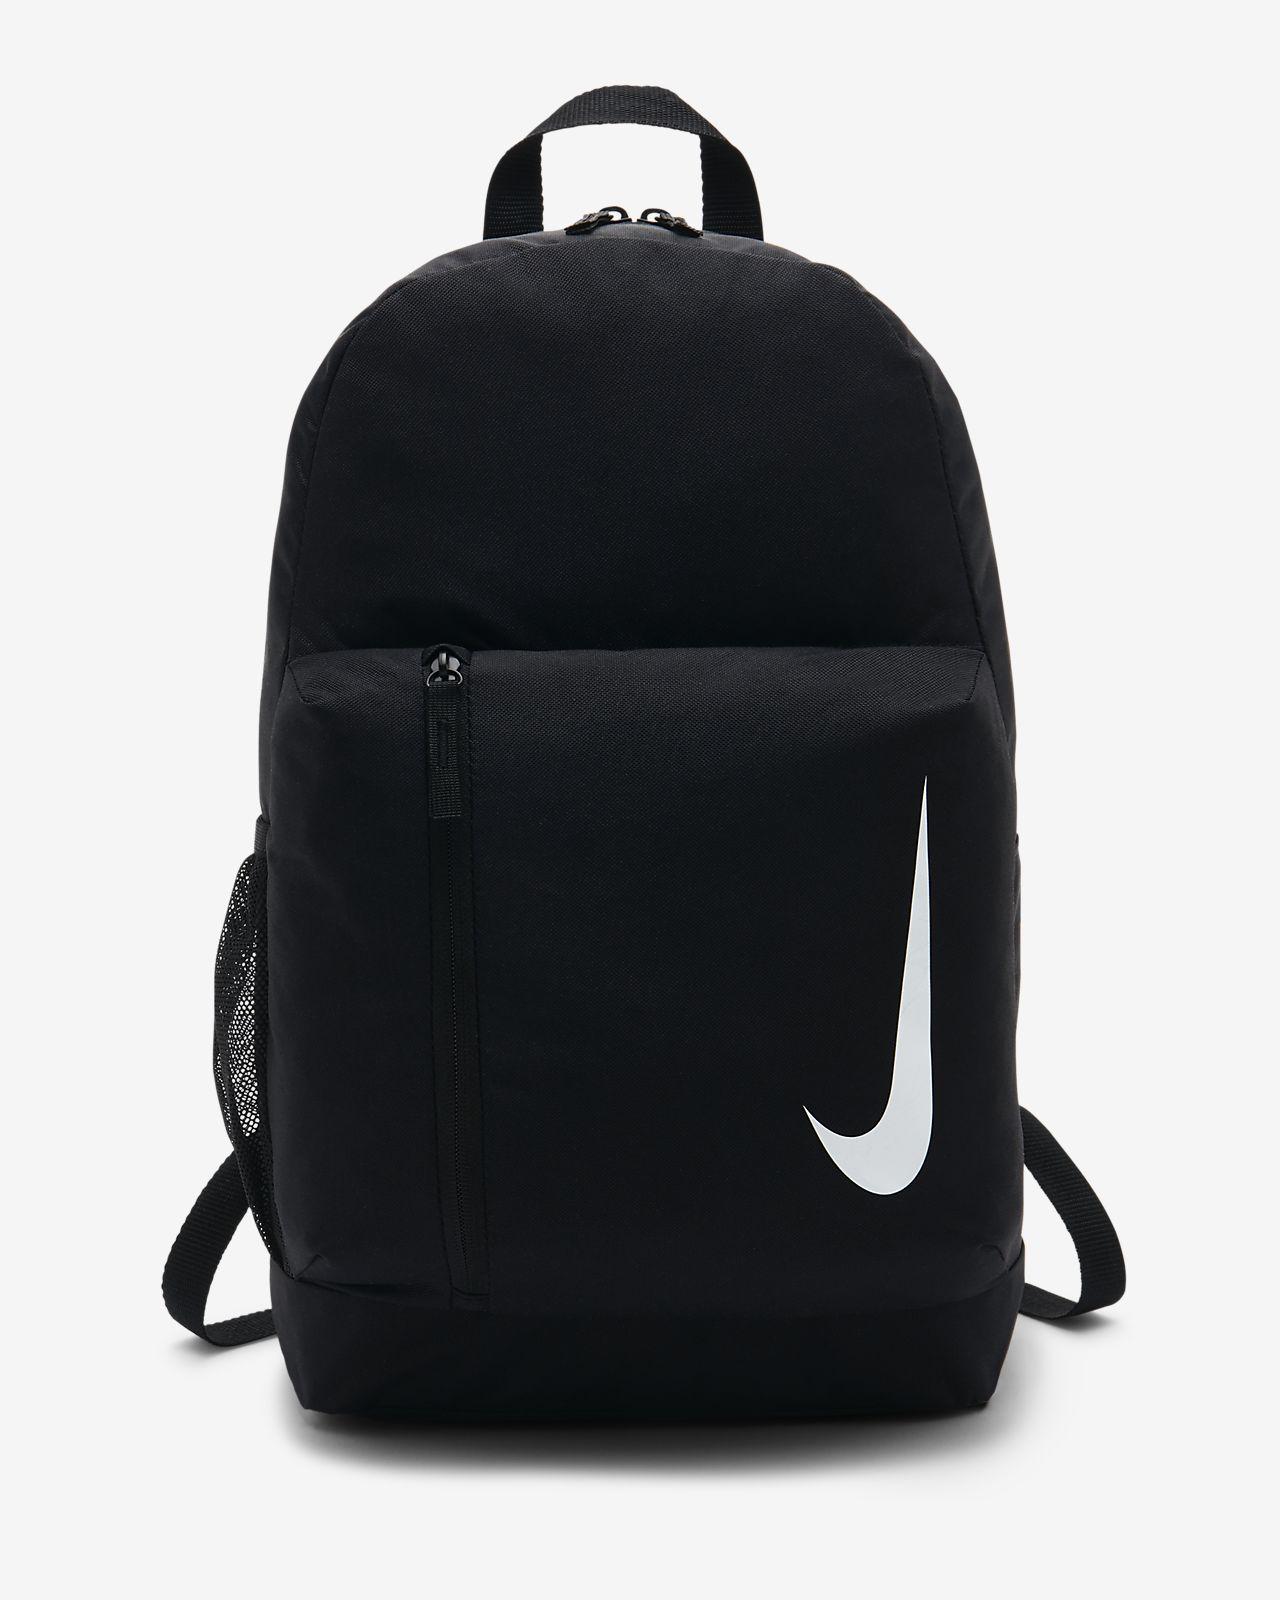 Nike Academy Team Voetbalrugzak voor kids